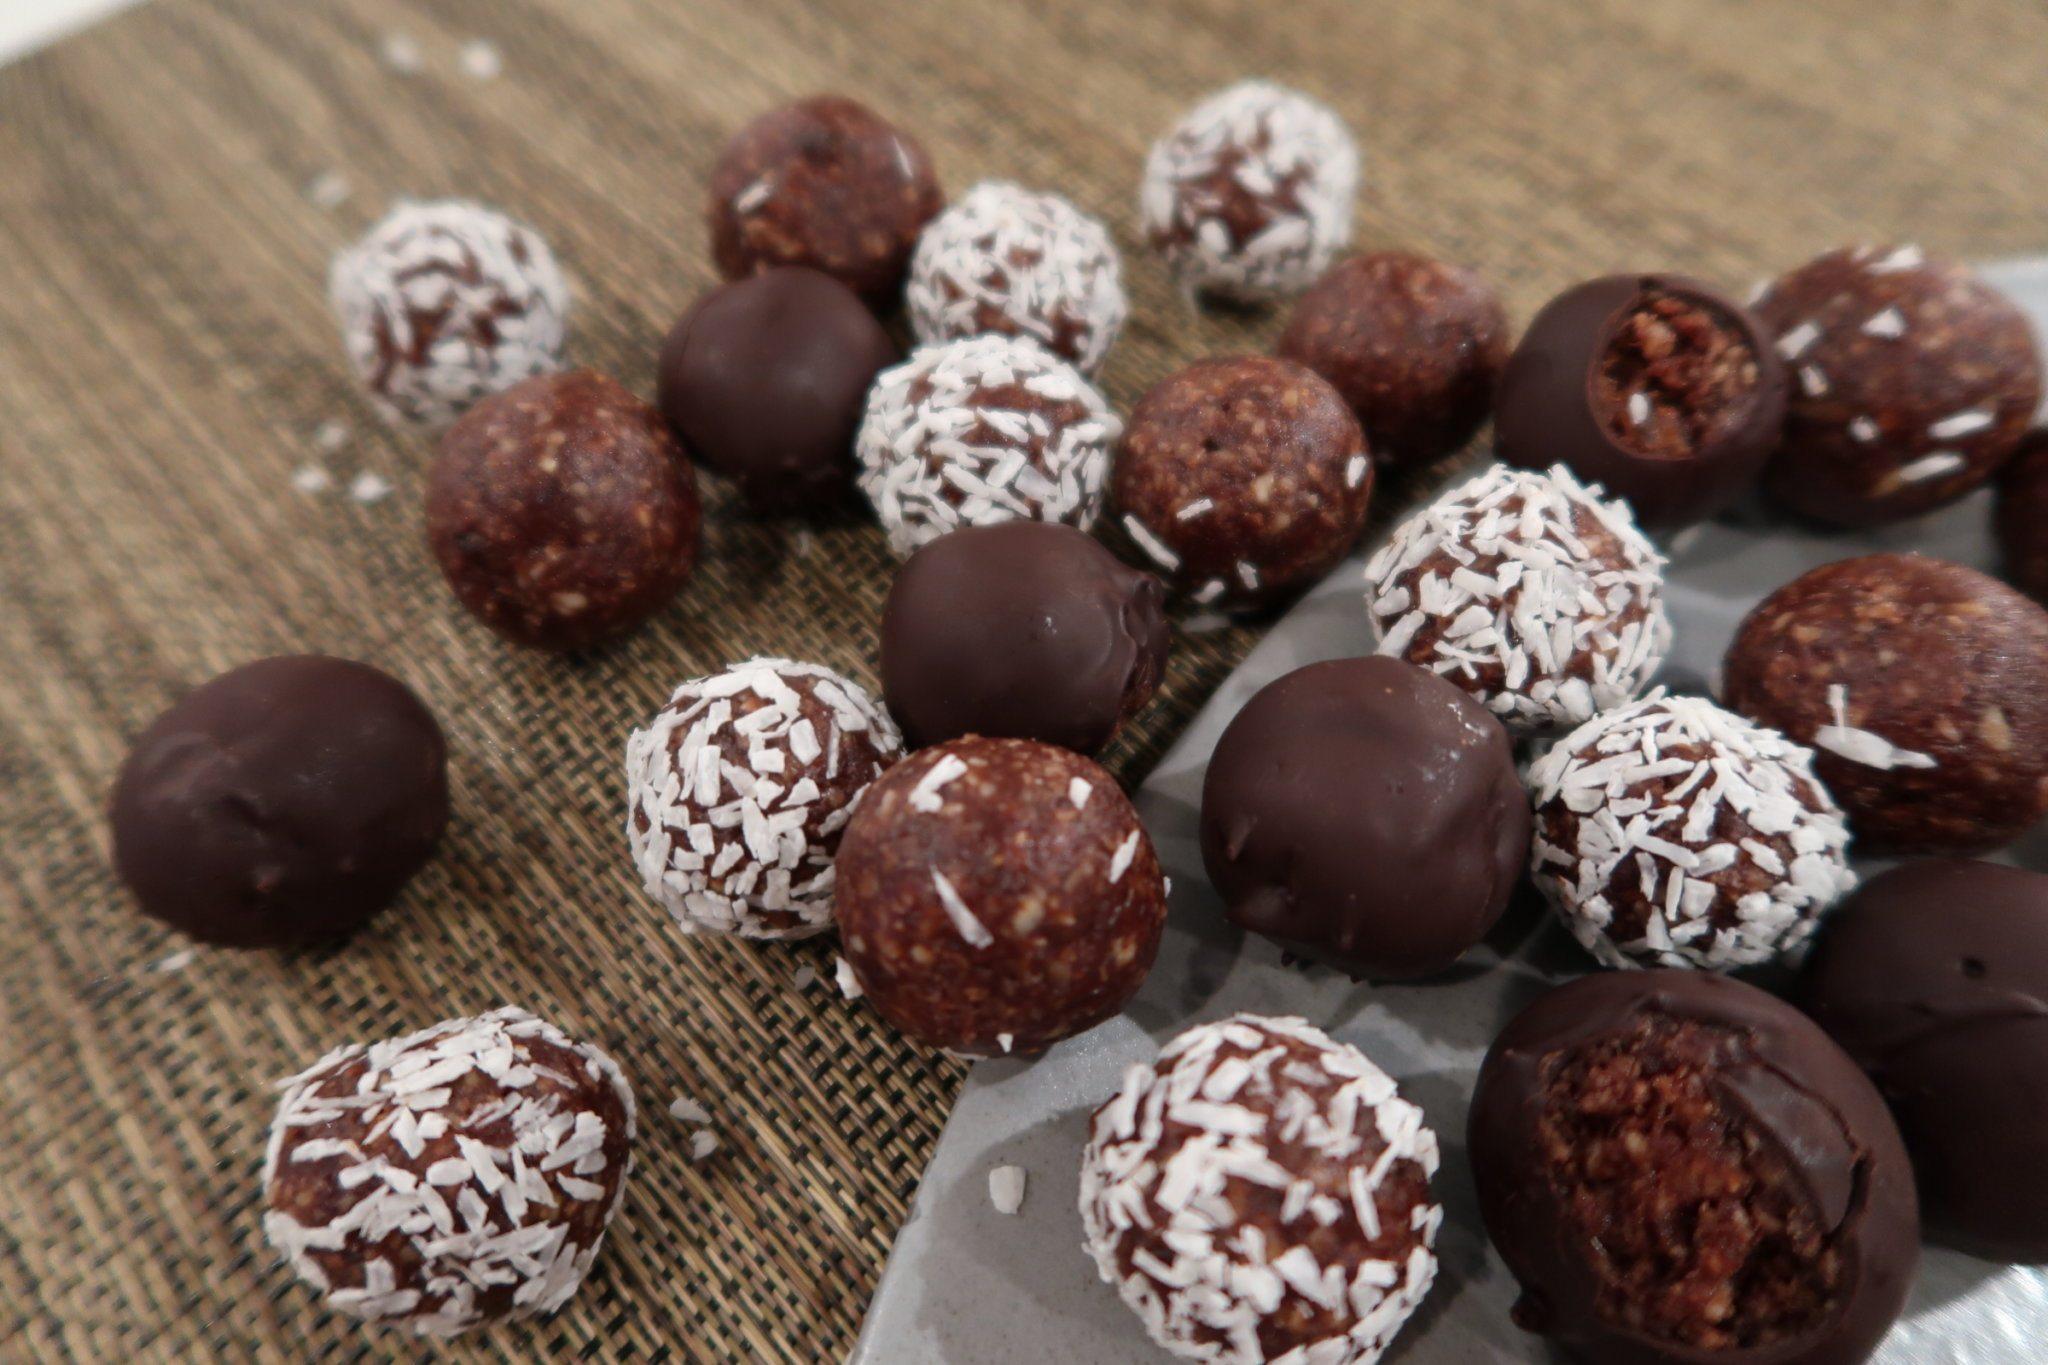 Juledadelkugler - en sund og lækker jule snack